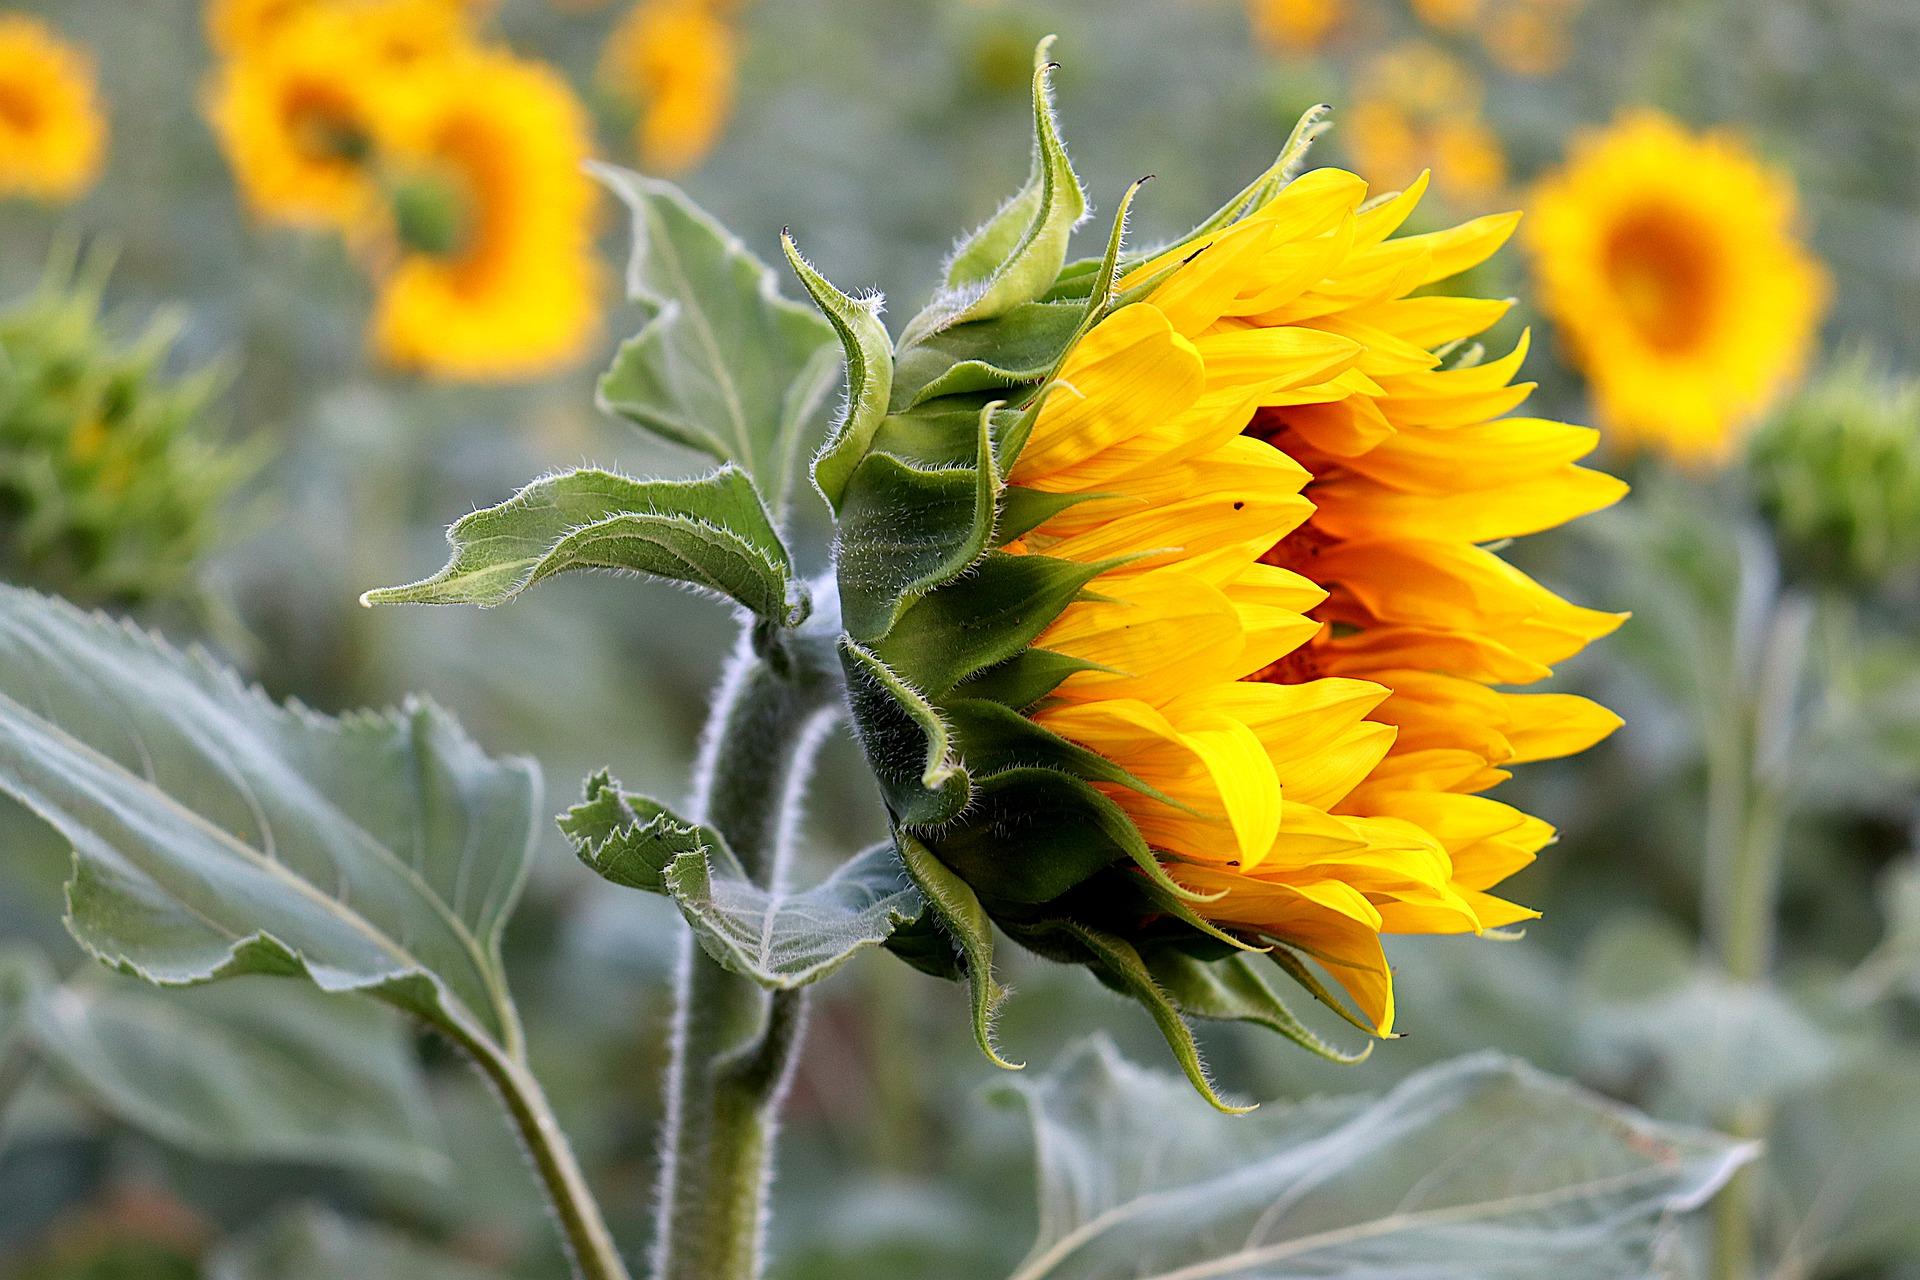 sunflower-5400912_1920